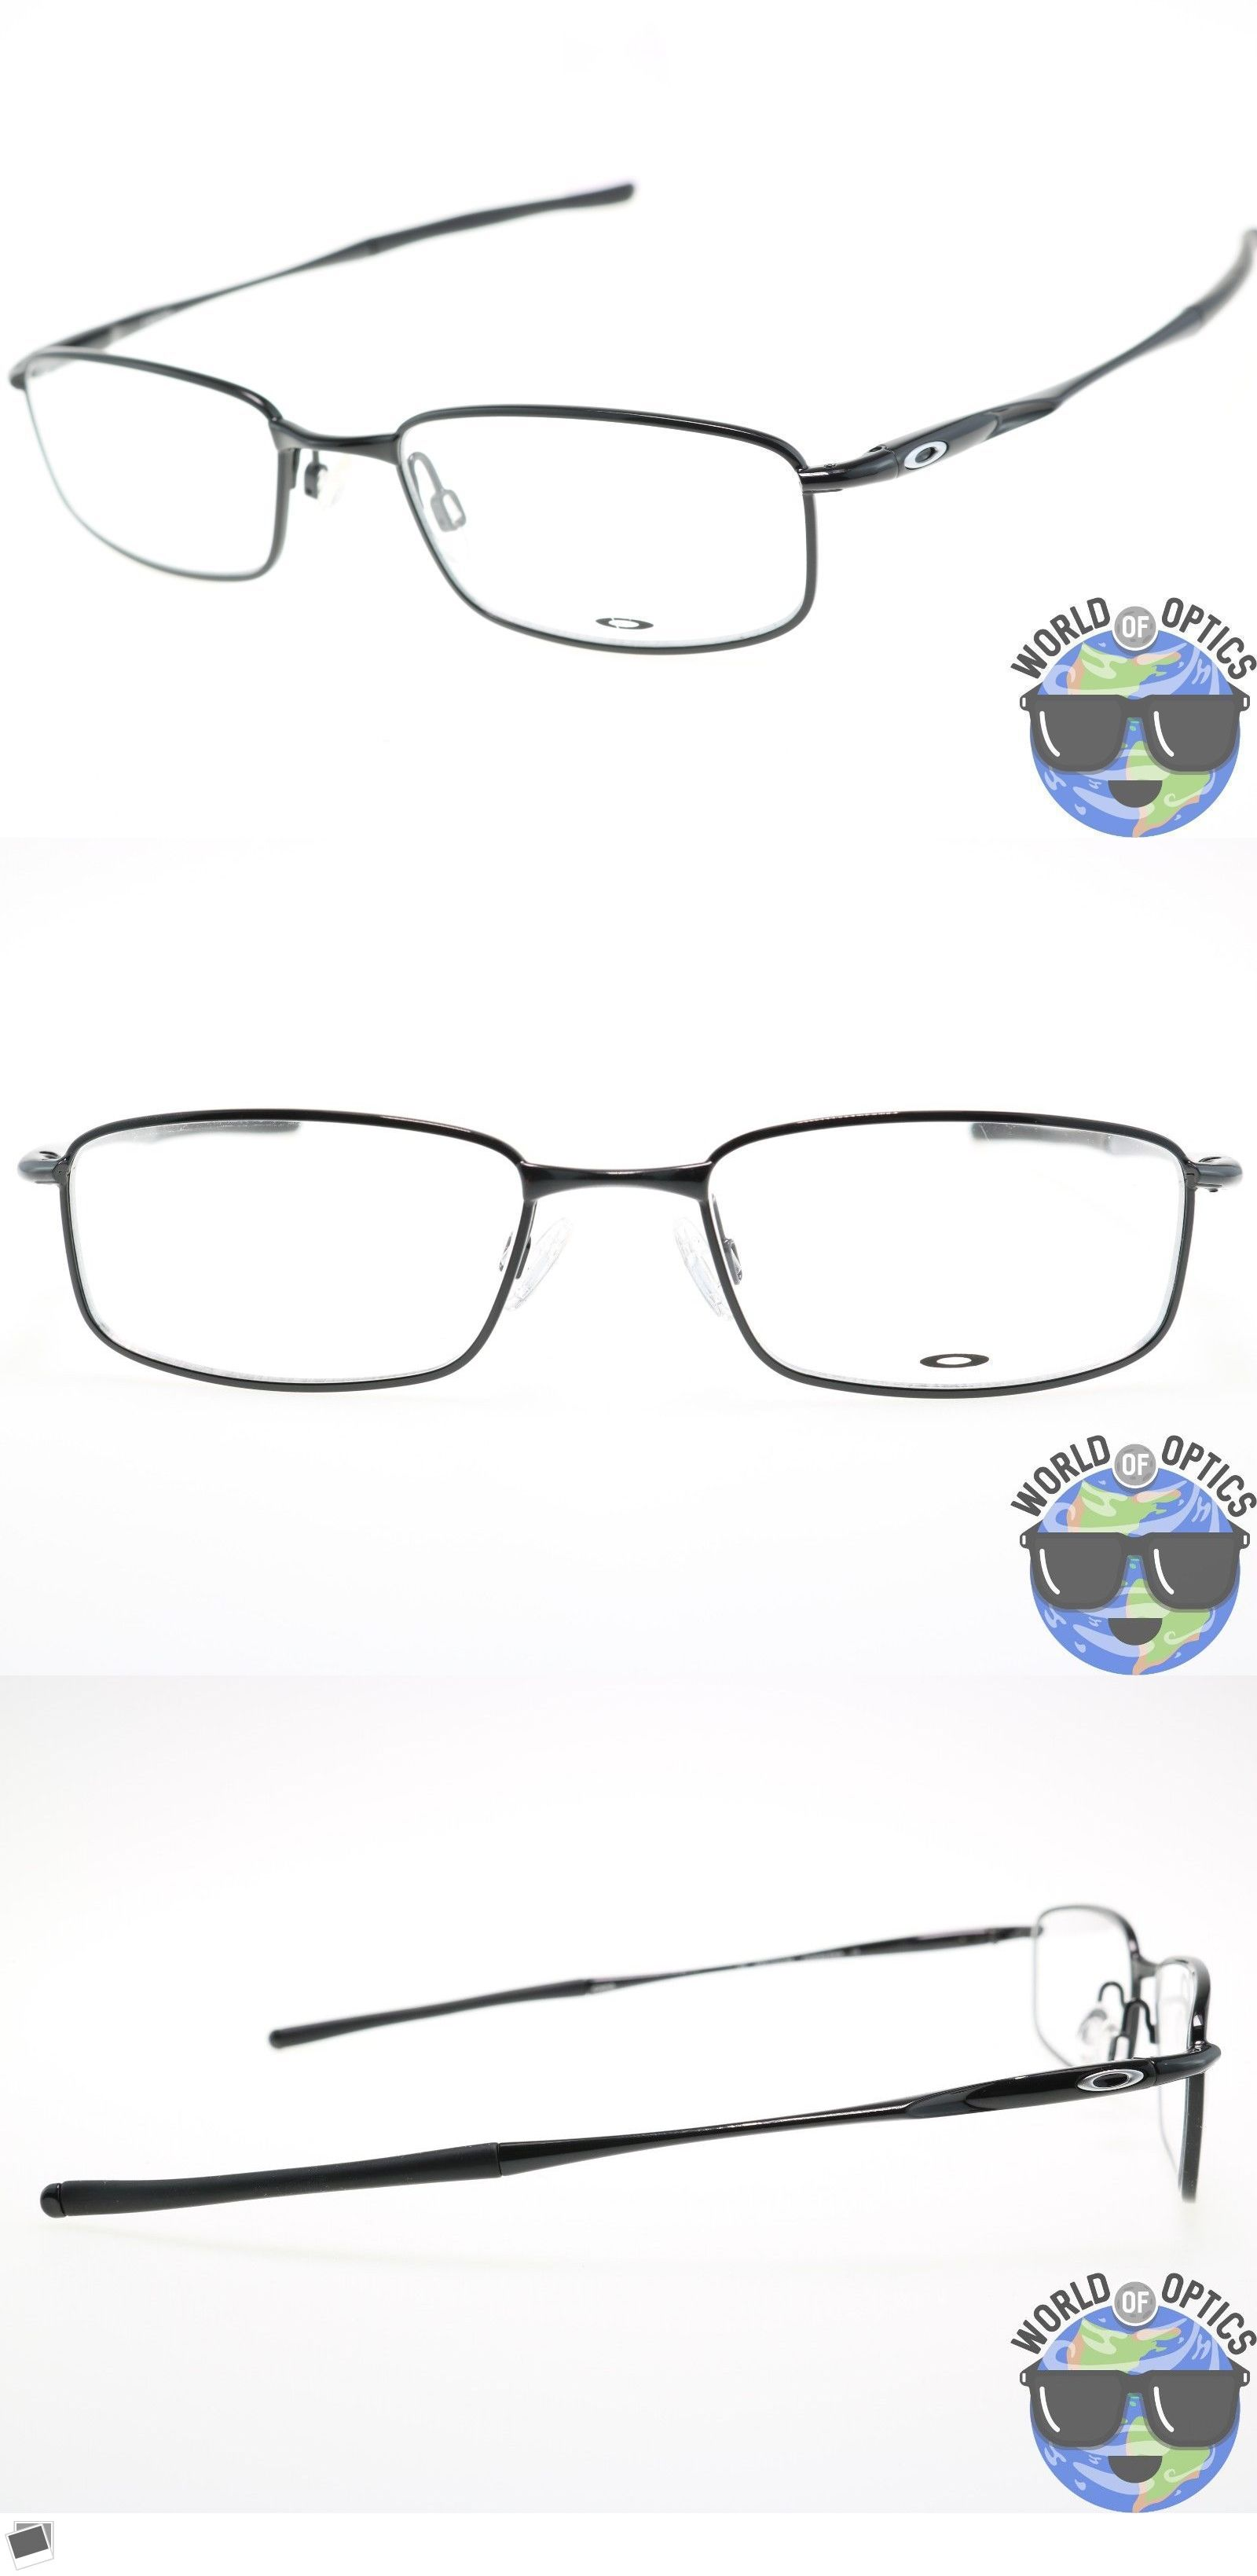 db2c42a965 Eyeglass Frames  Oakley Rx Eyeglasses Casing Ox3110-0152 Polished Black  Frame  52-